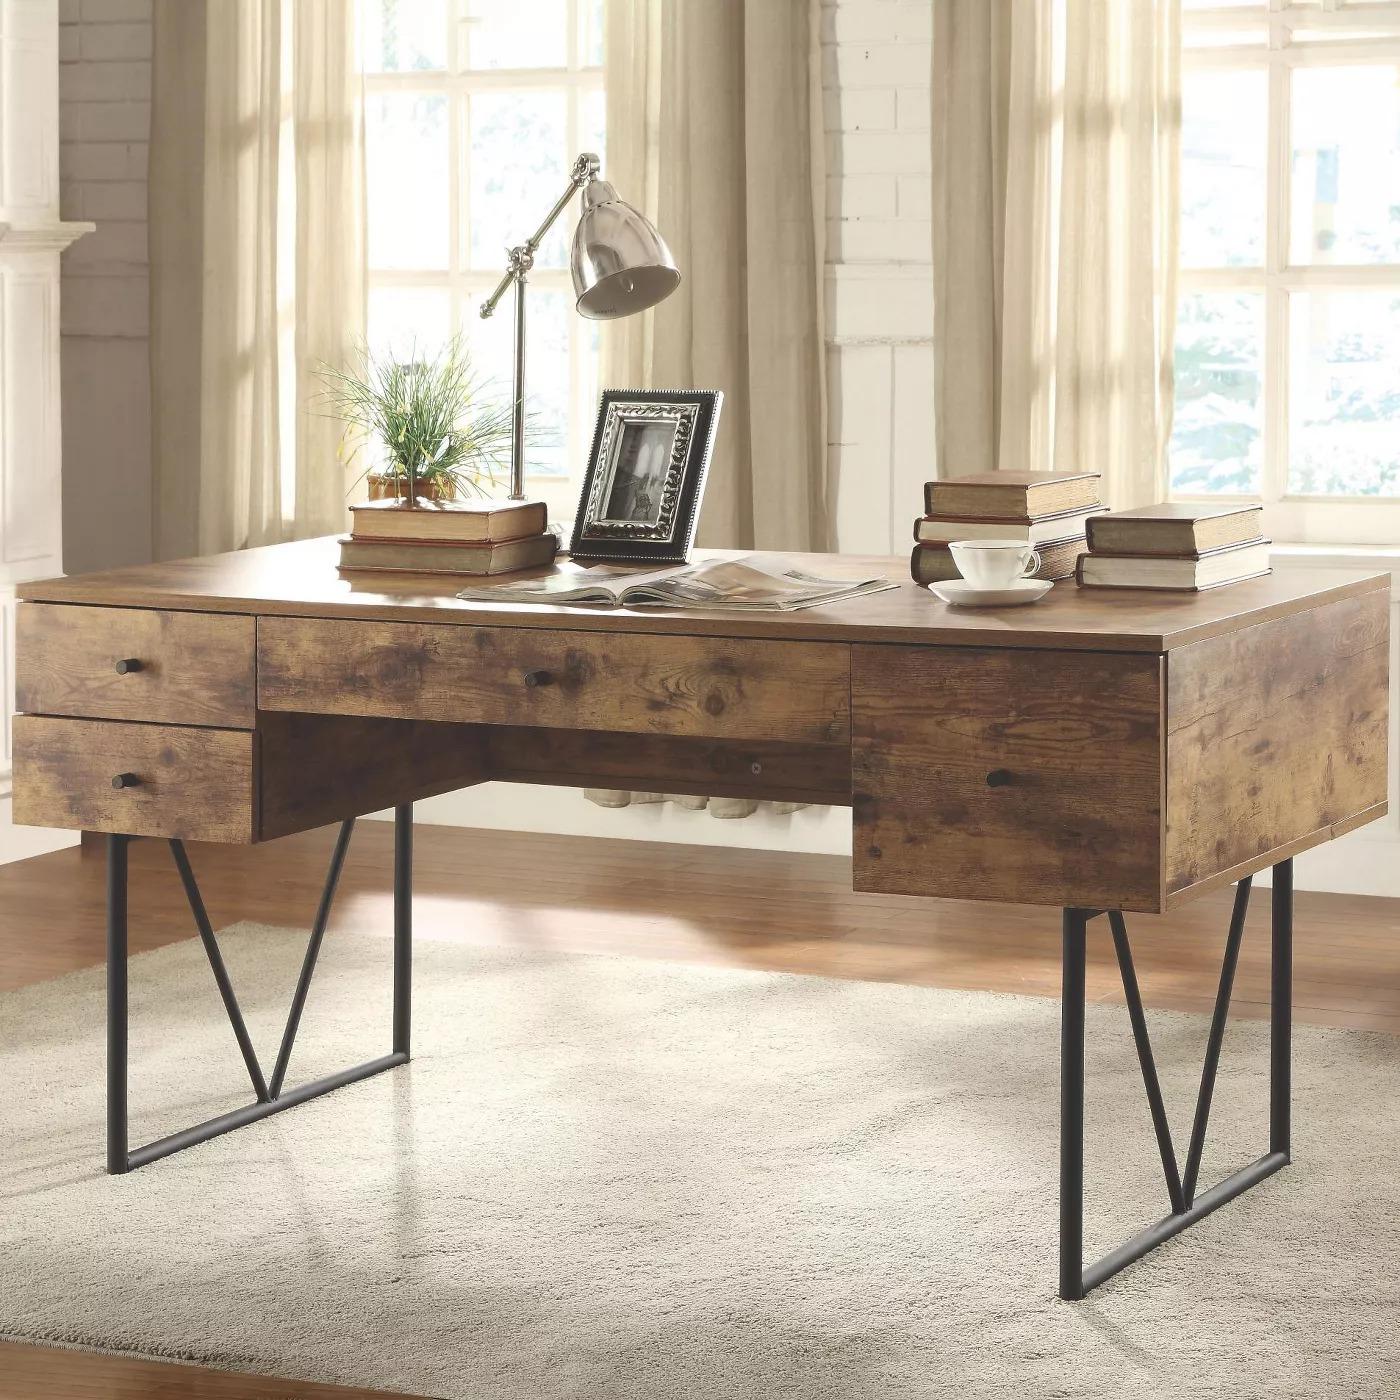 Coaster Home Furnishings Barritt 4 Drawer Home Office Writing Desk